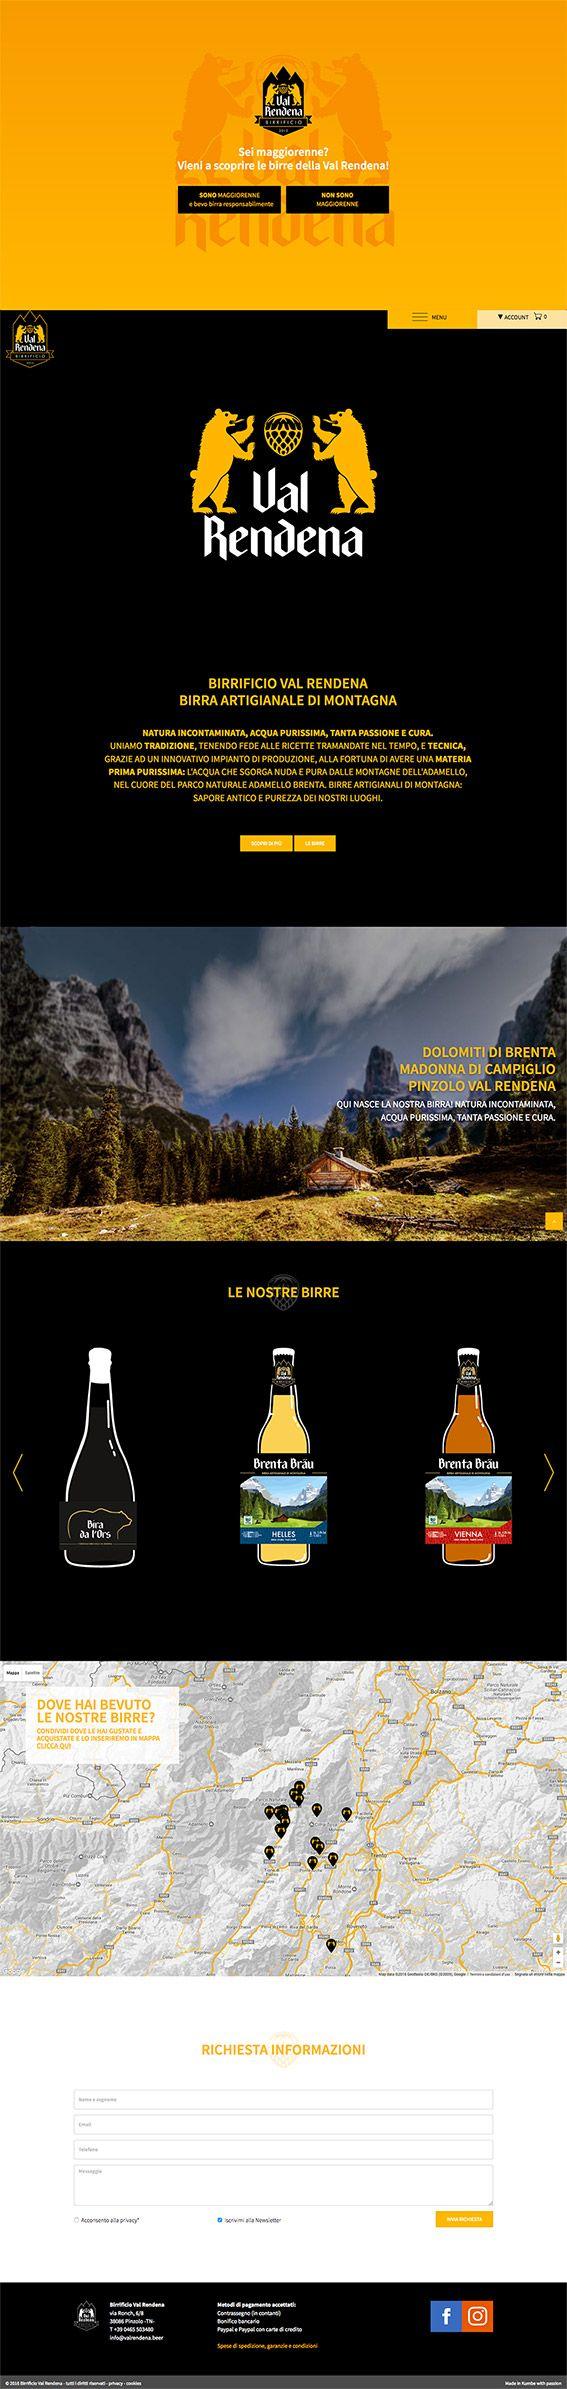 #valrendenabeer www.valrendena.beer #Kumbe #portfolioweb #webdesign #website #responsivedesign #responsive #birrificiovalrendena #birrificioartigianale #birrificio #birra #beer #bier #artigianale #brentabrau #dolomitidibrenta #dolomiti #ecommerce #valrendena #pinzolo #madonnadicampiglio #trentino #italia #malto #orzo #acqua #water #malt #barley #luppolo #hops #vienna #helles #biradalors #weizen #birradinatale #birrasenzaglutine #glutenfree #love #fun #firends #passione #natura #passion